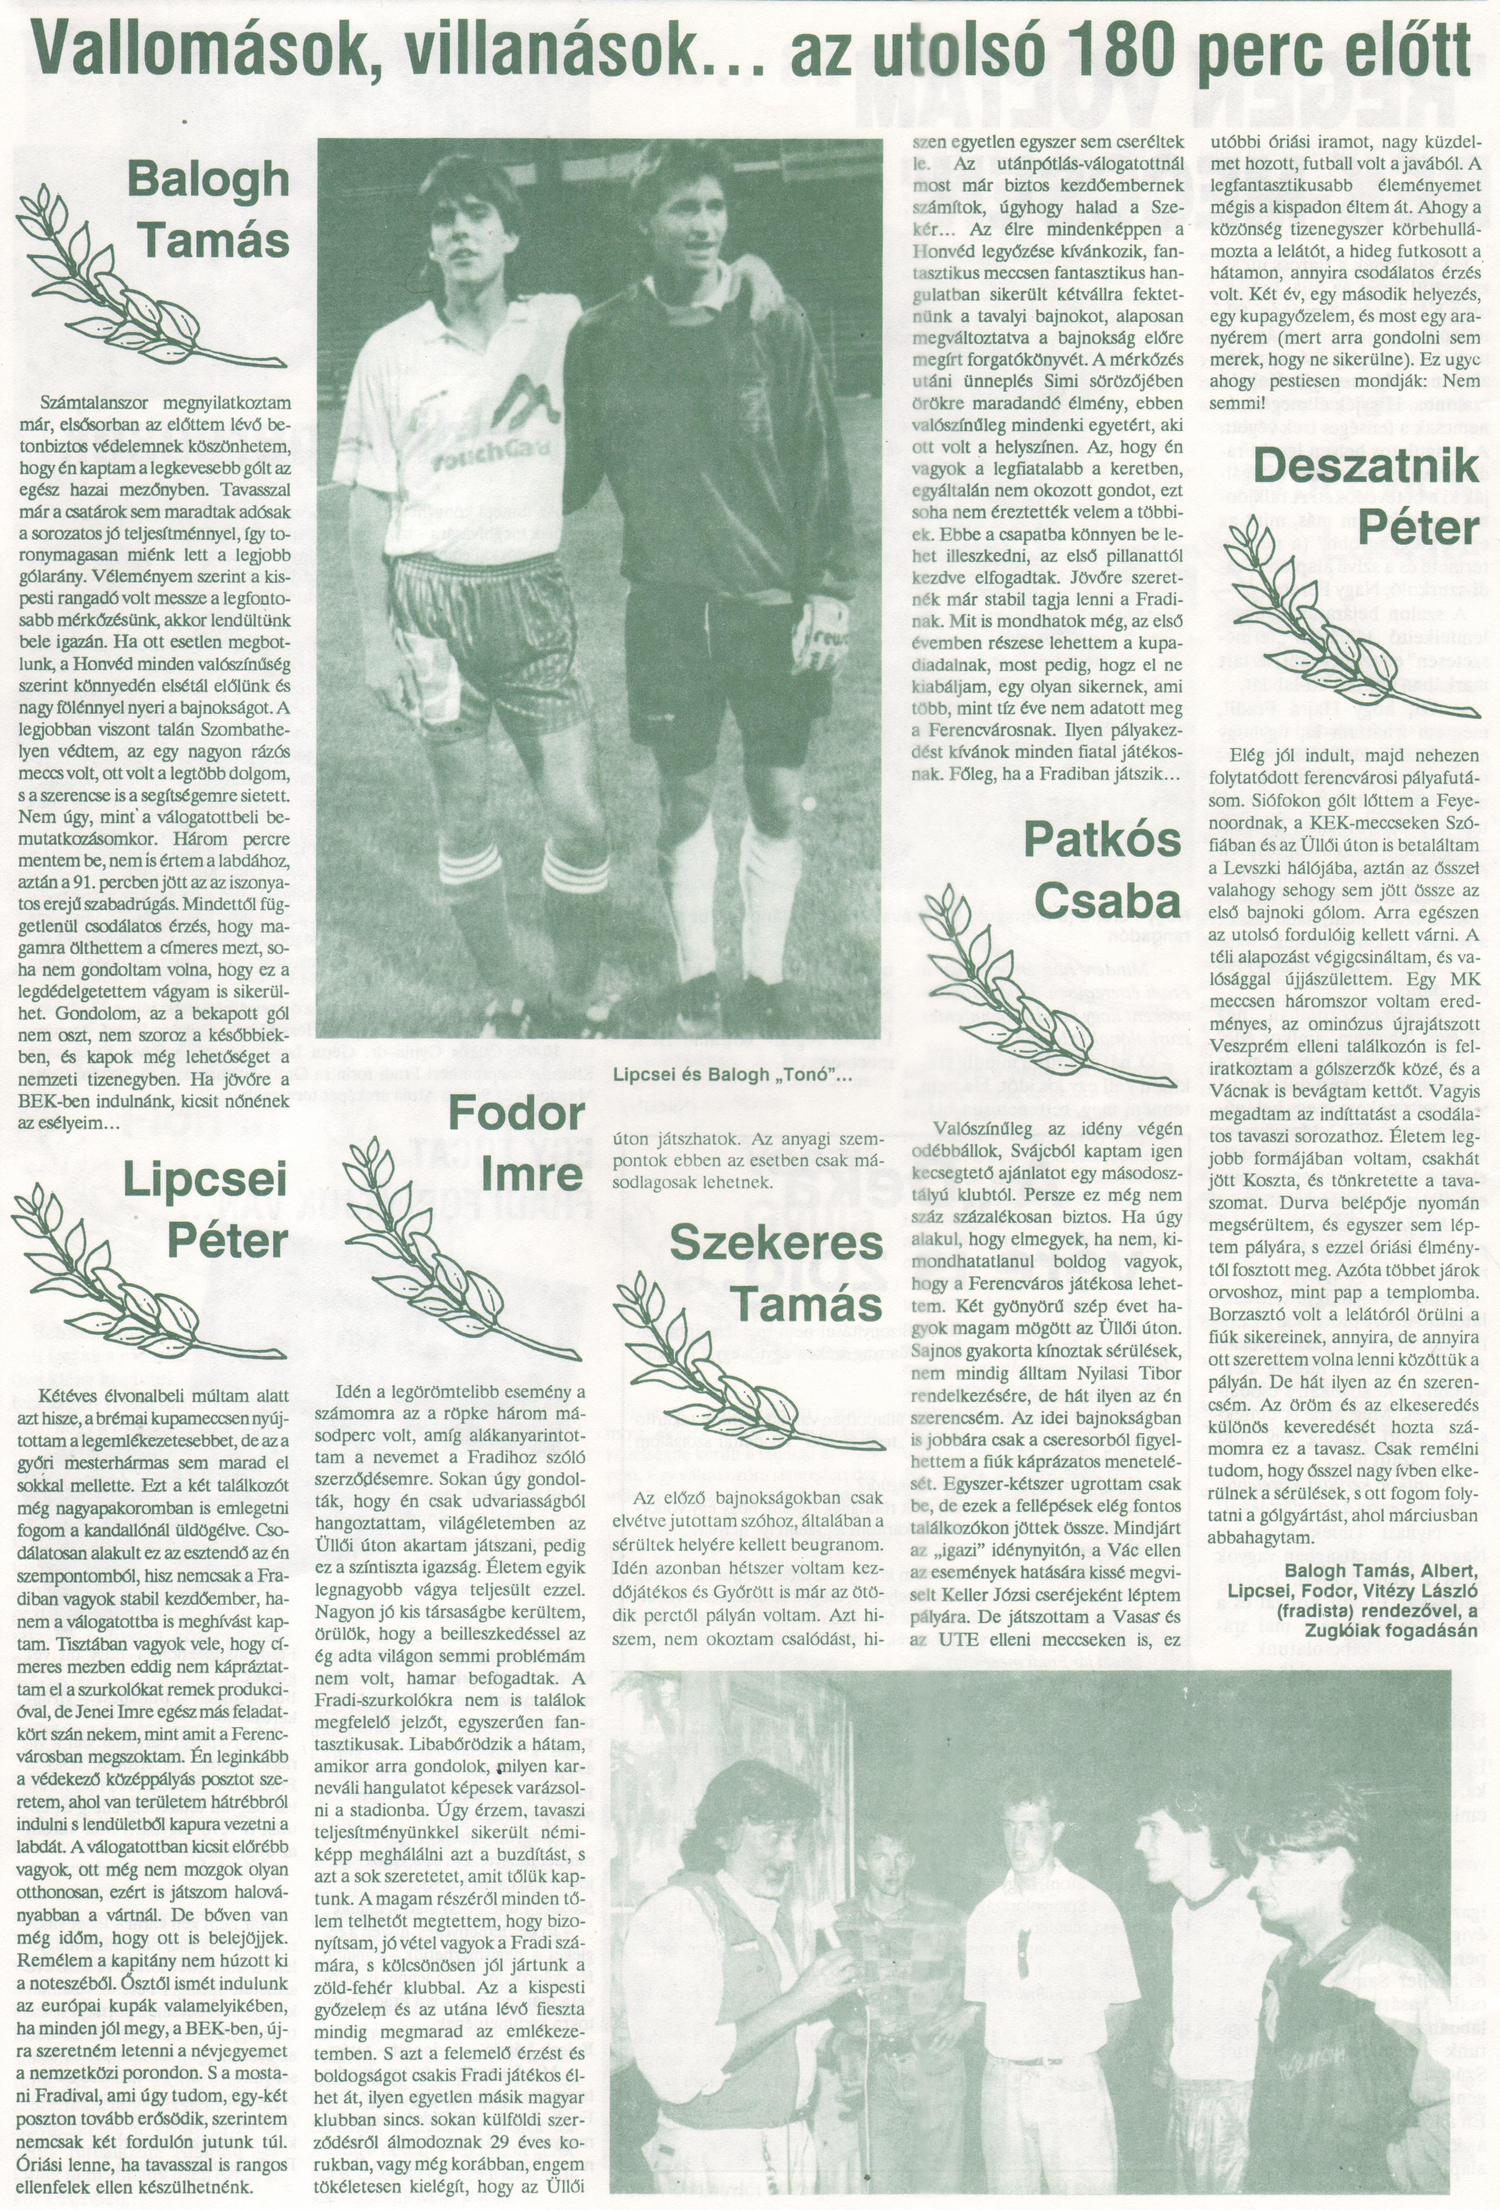 TFU_19920610_FU-Zs_009 - 0010